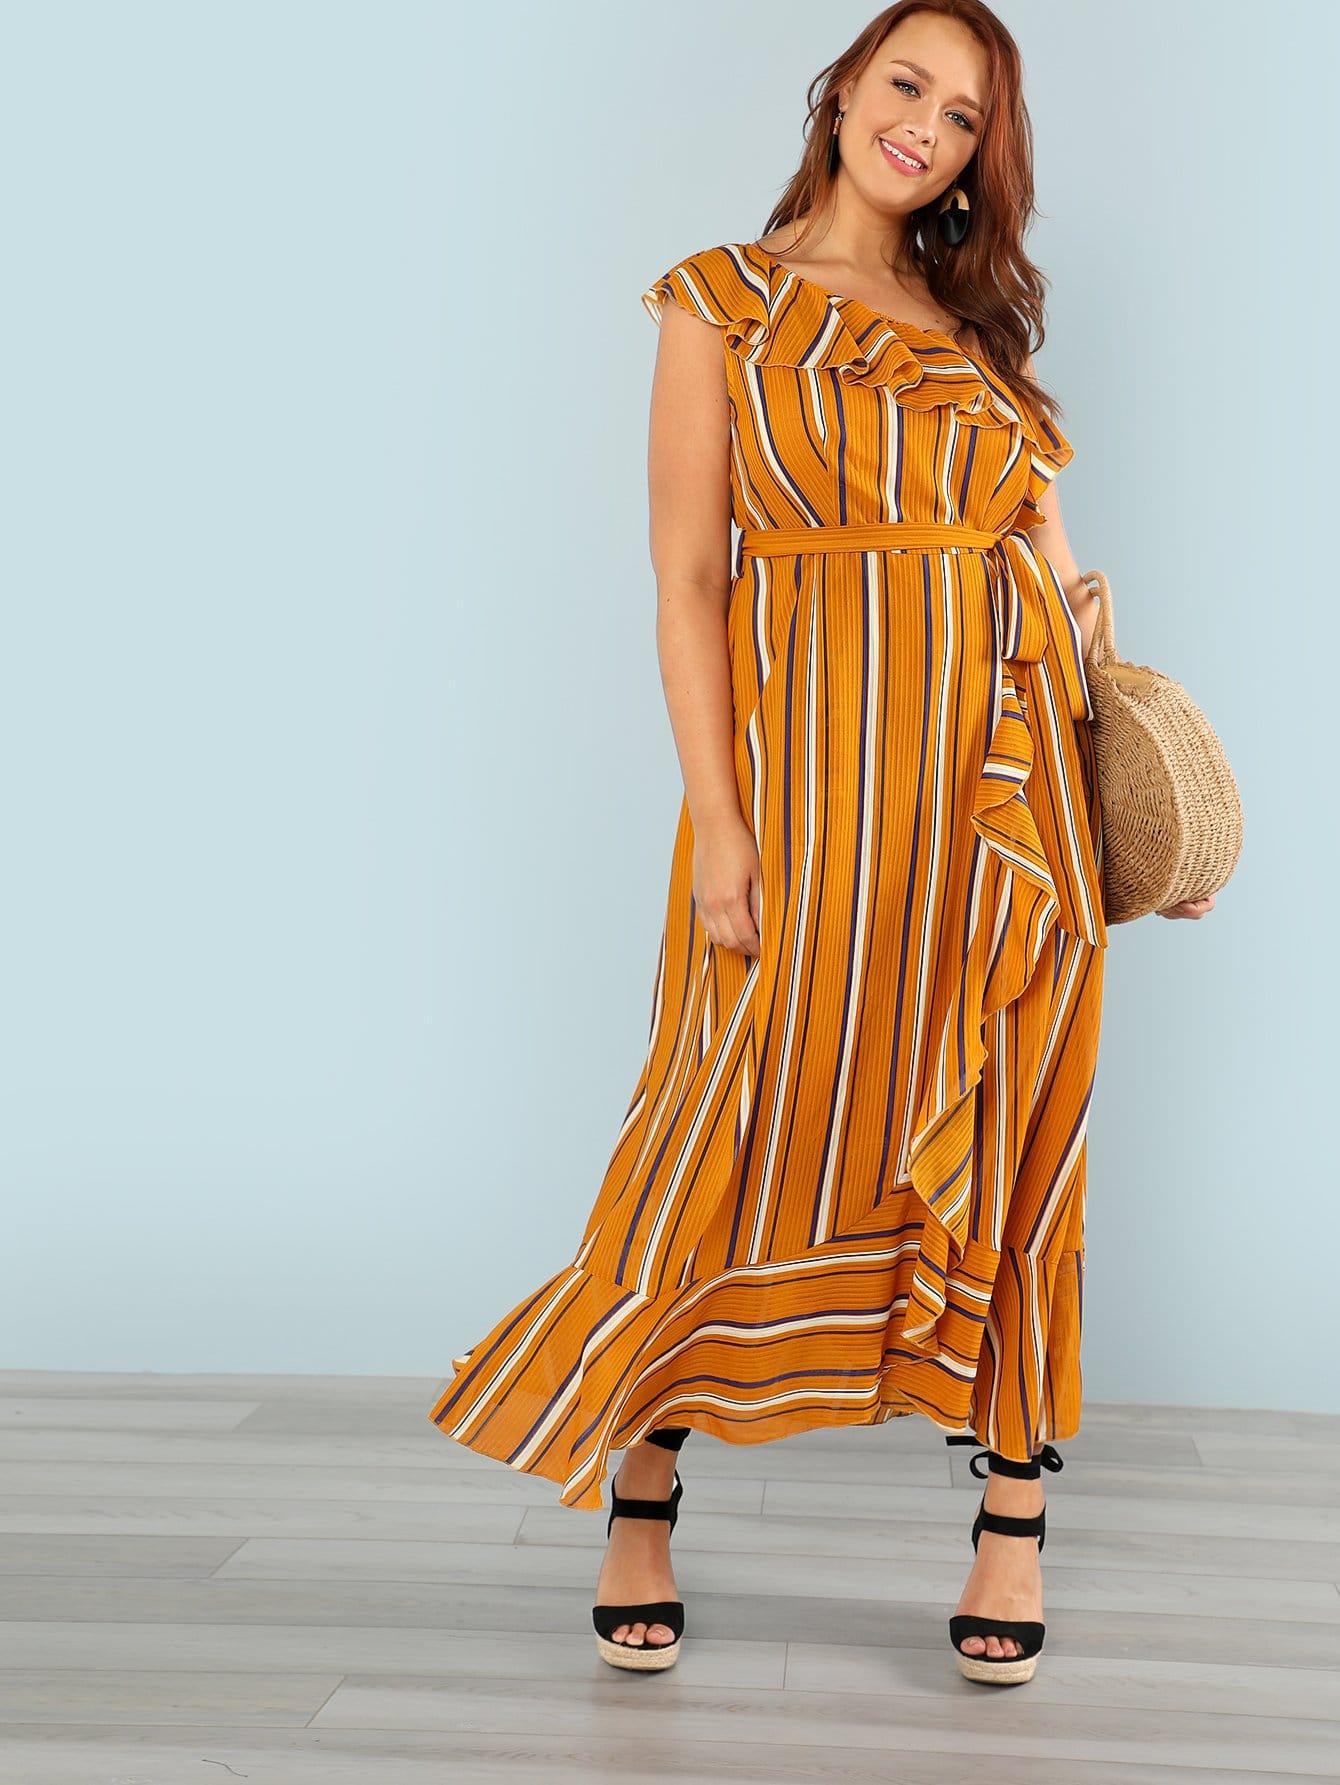 One Shoulder Striped Ruffle Dress one shoulder ruffle embellished dress